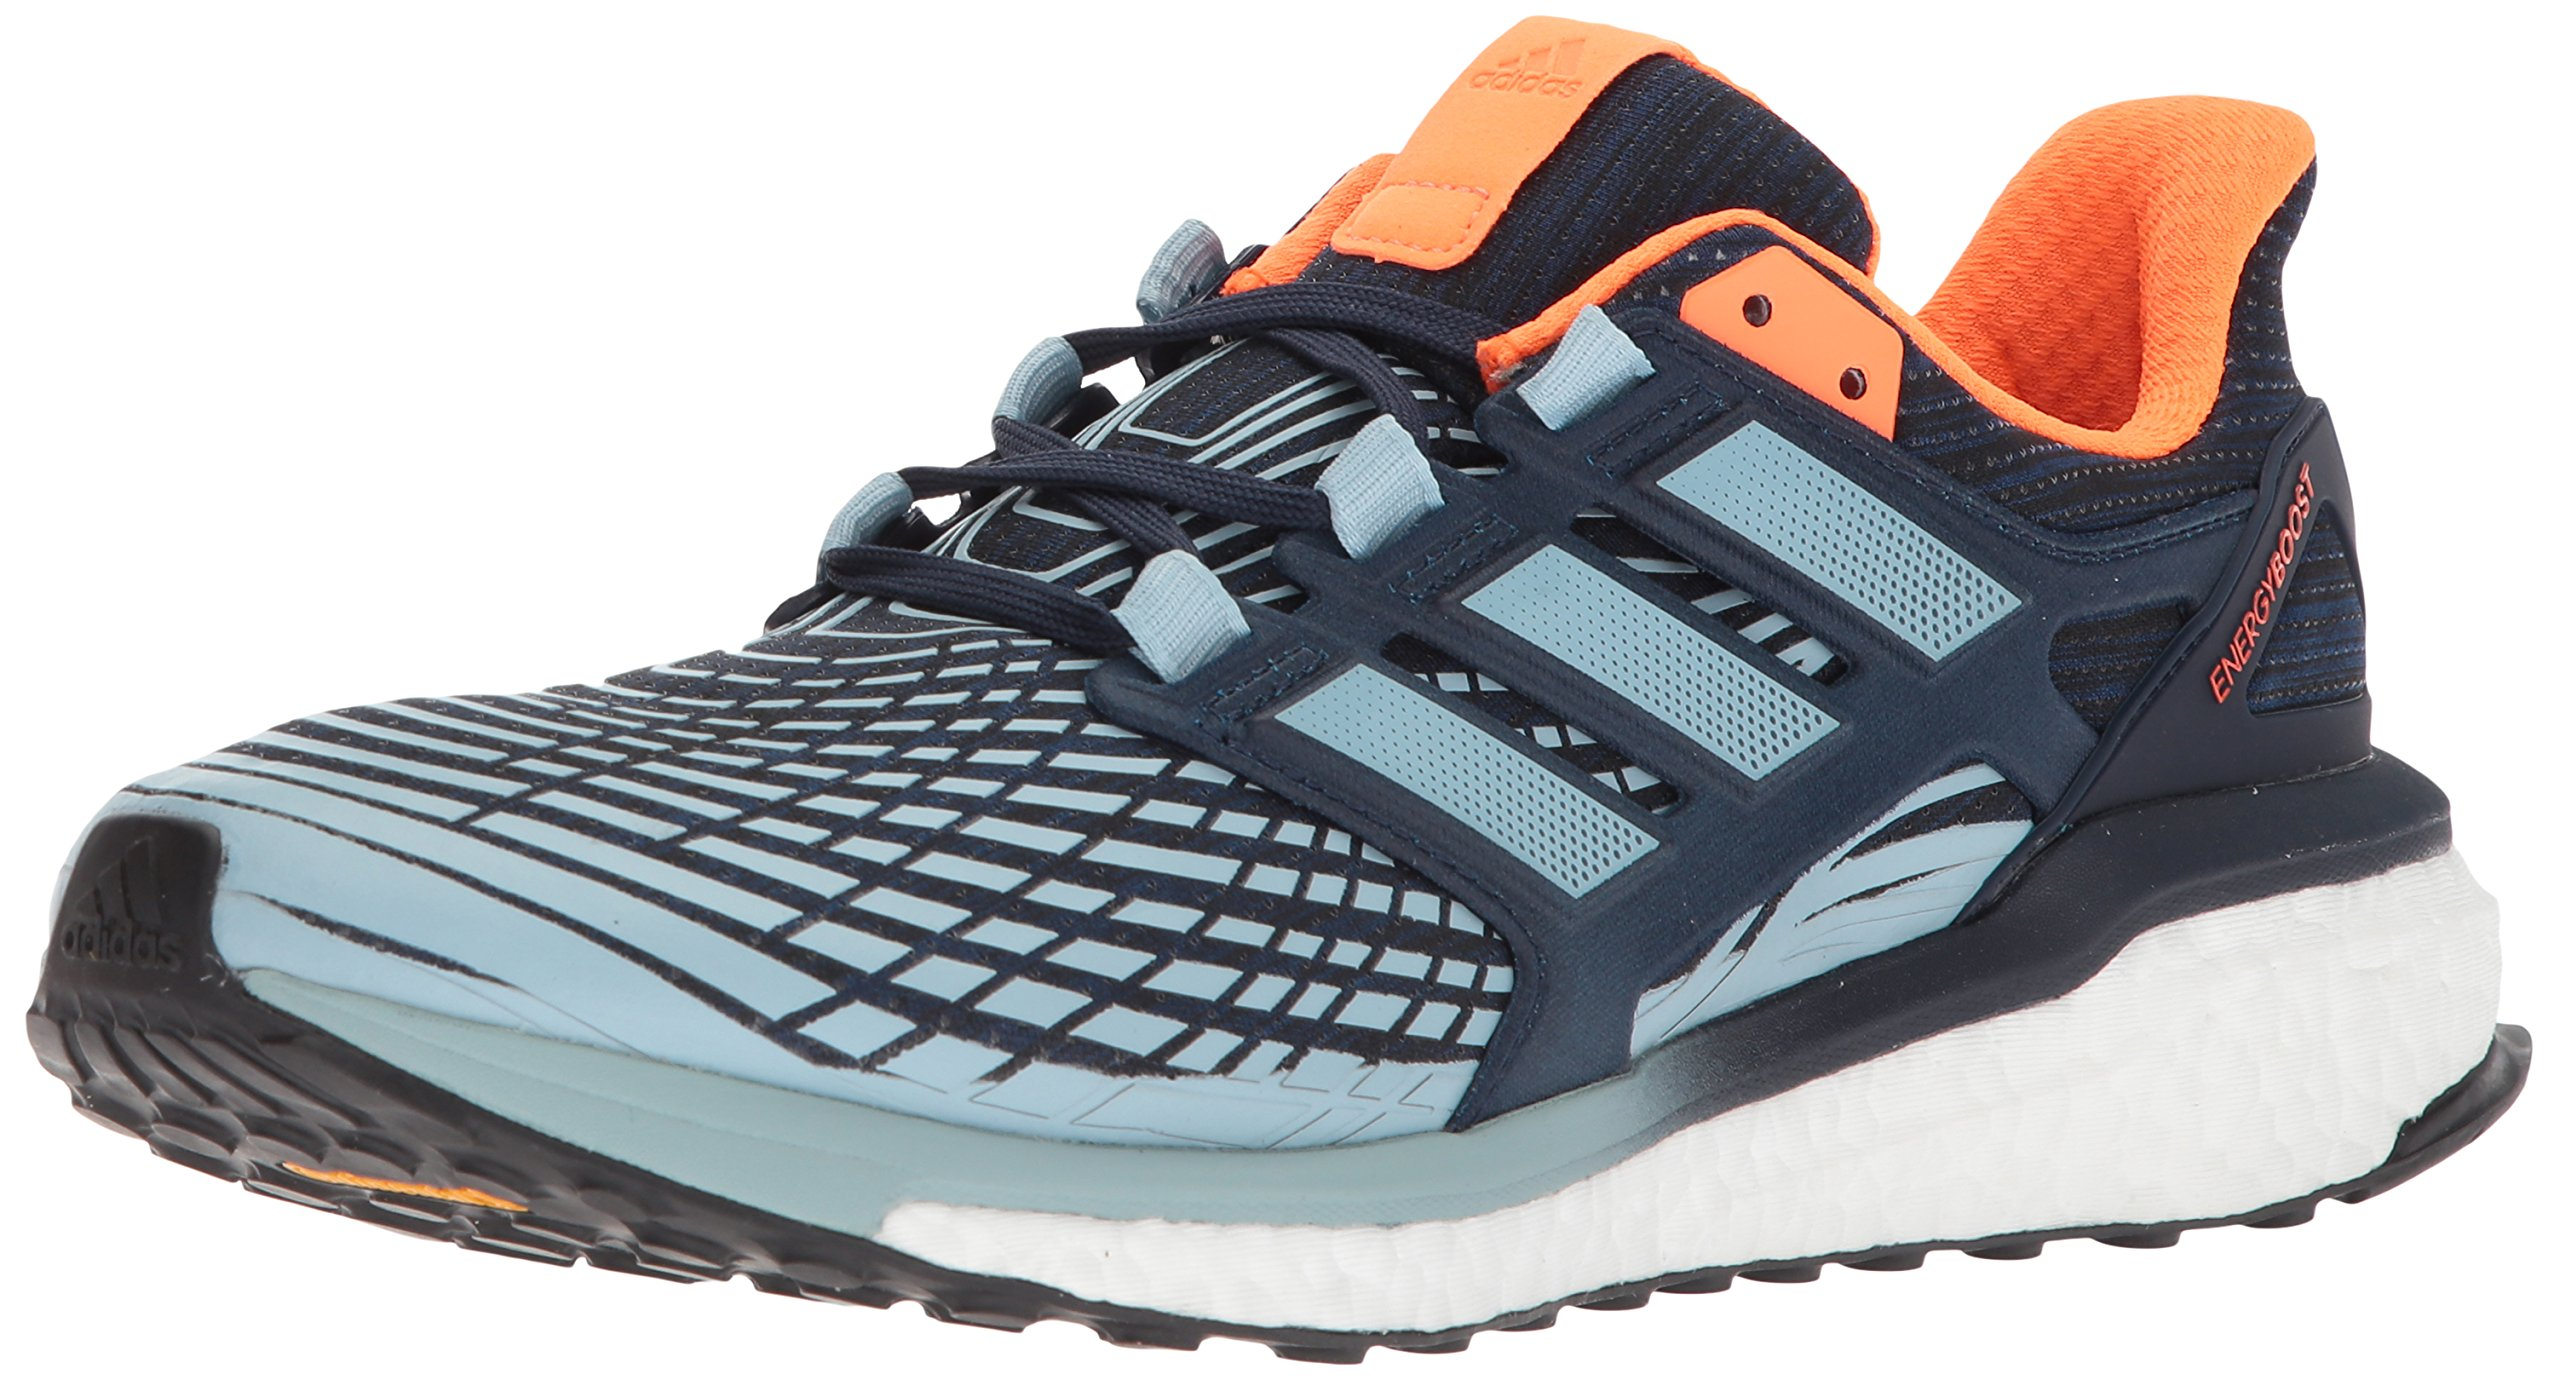 Los Angeles 4c87c 0ed92 adidas Performance Men's Energy Boost M Running Shoe, Collegiate Navy/Ash  Grey/Warning, 8 M US